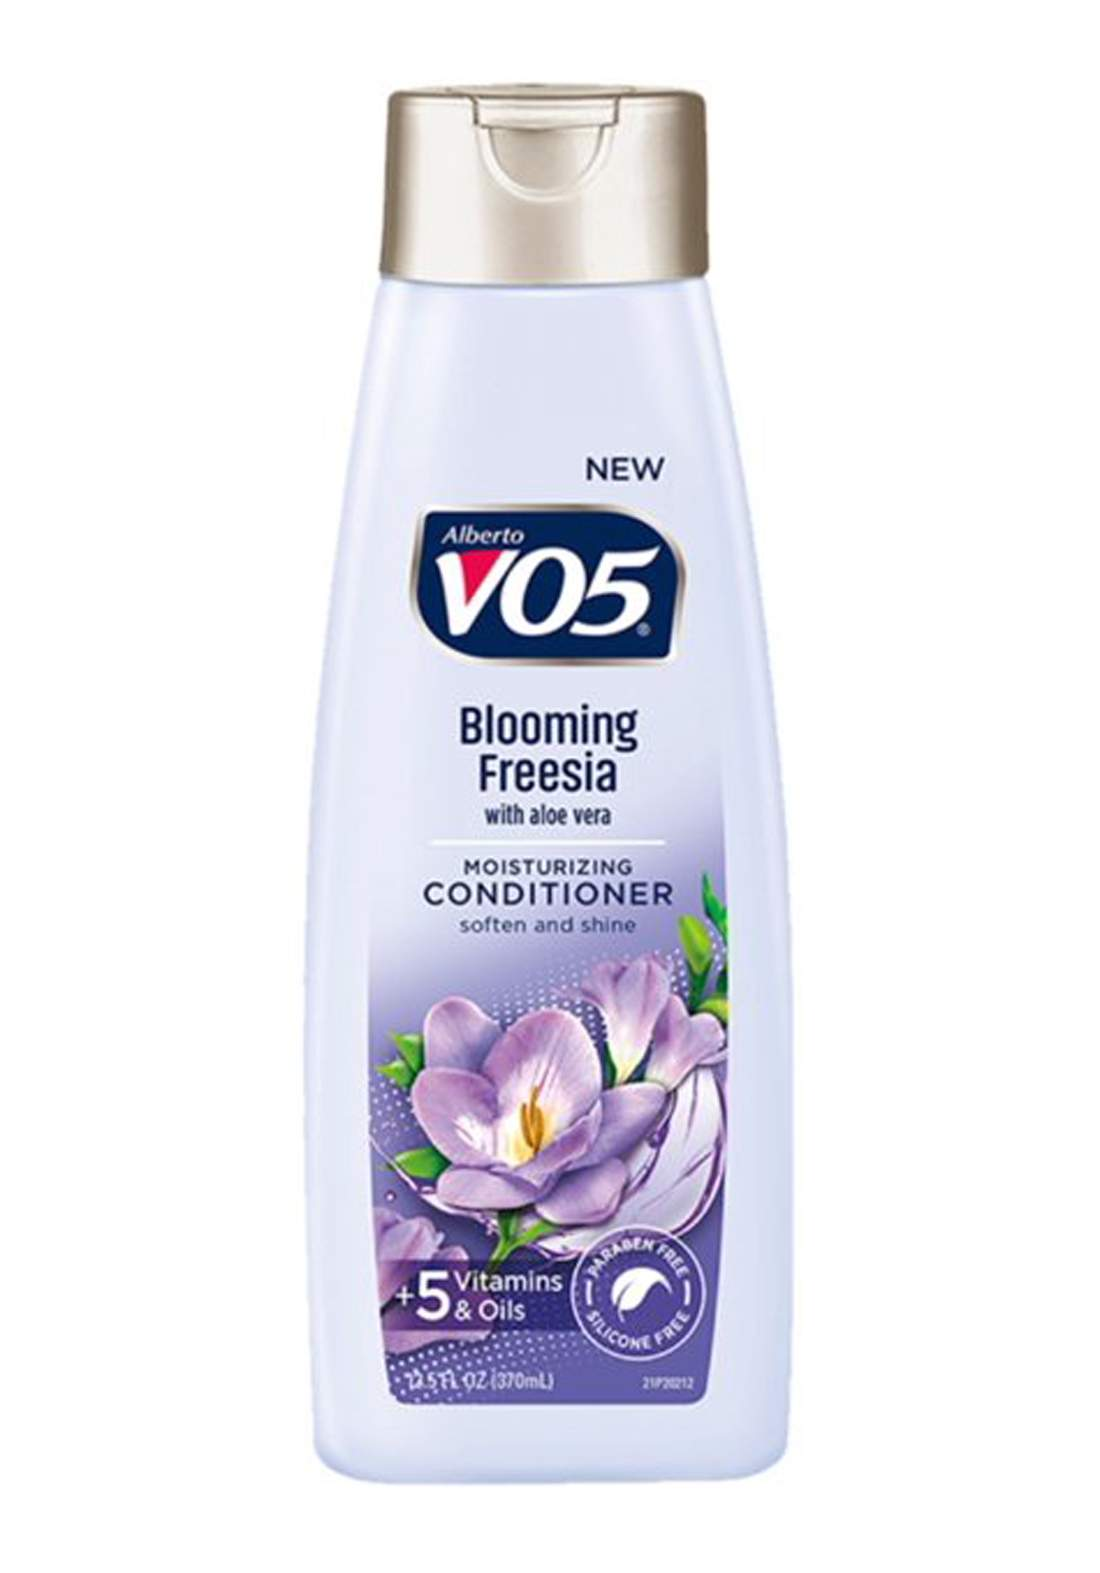 VO5 Ocean Refresh Revitalizing Conditioner  370ml بلسم للشعر